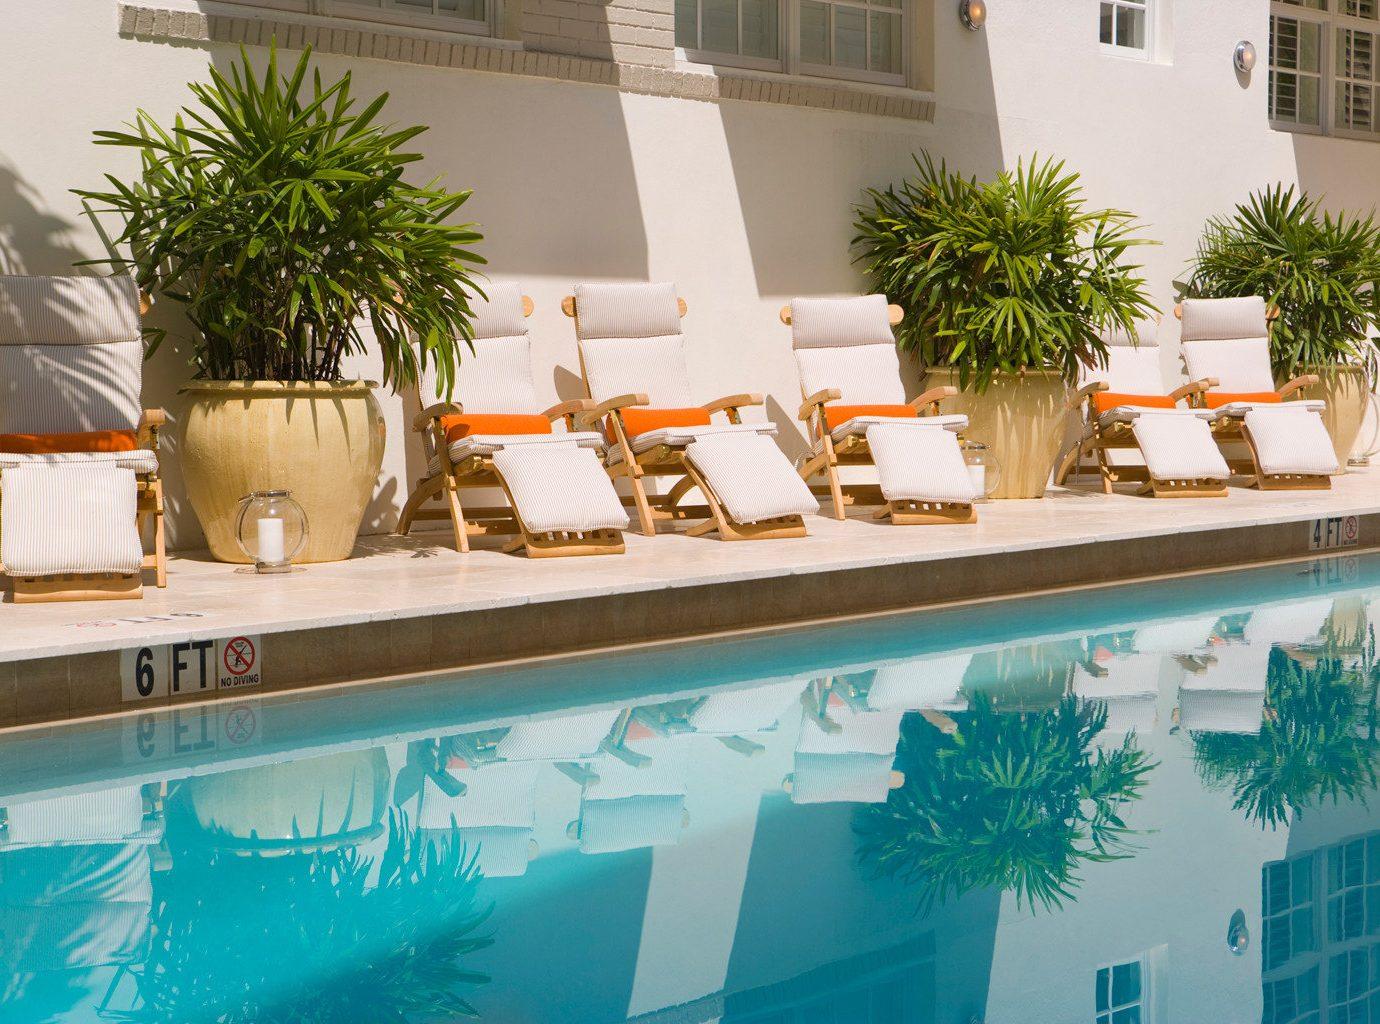 Hotels Trip Ideas plant meal restaurant home interior design Design swimming pool